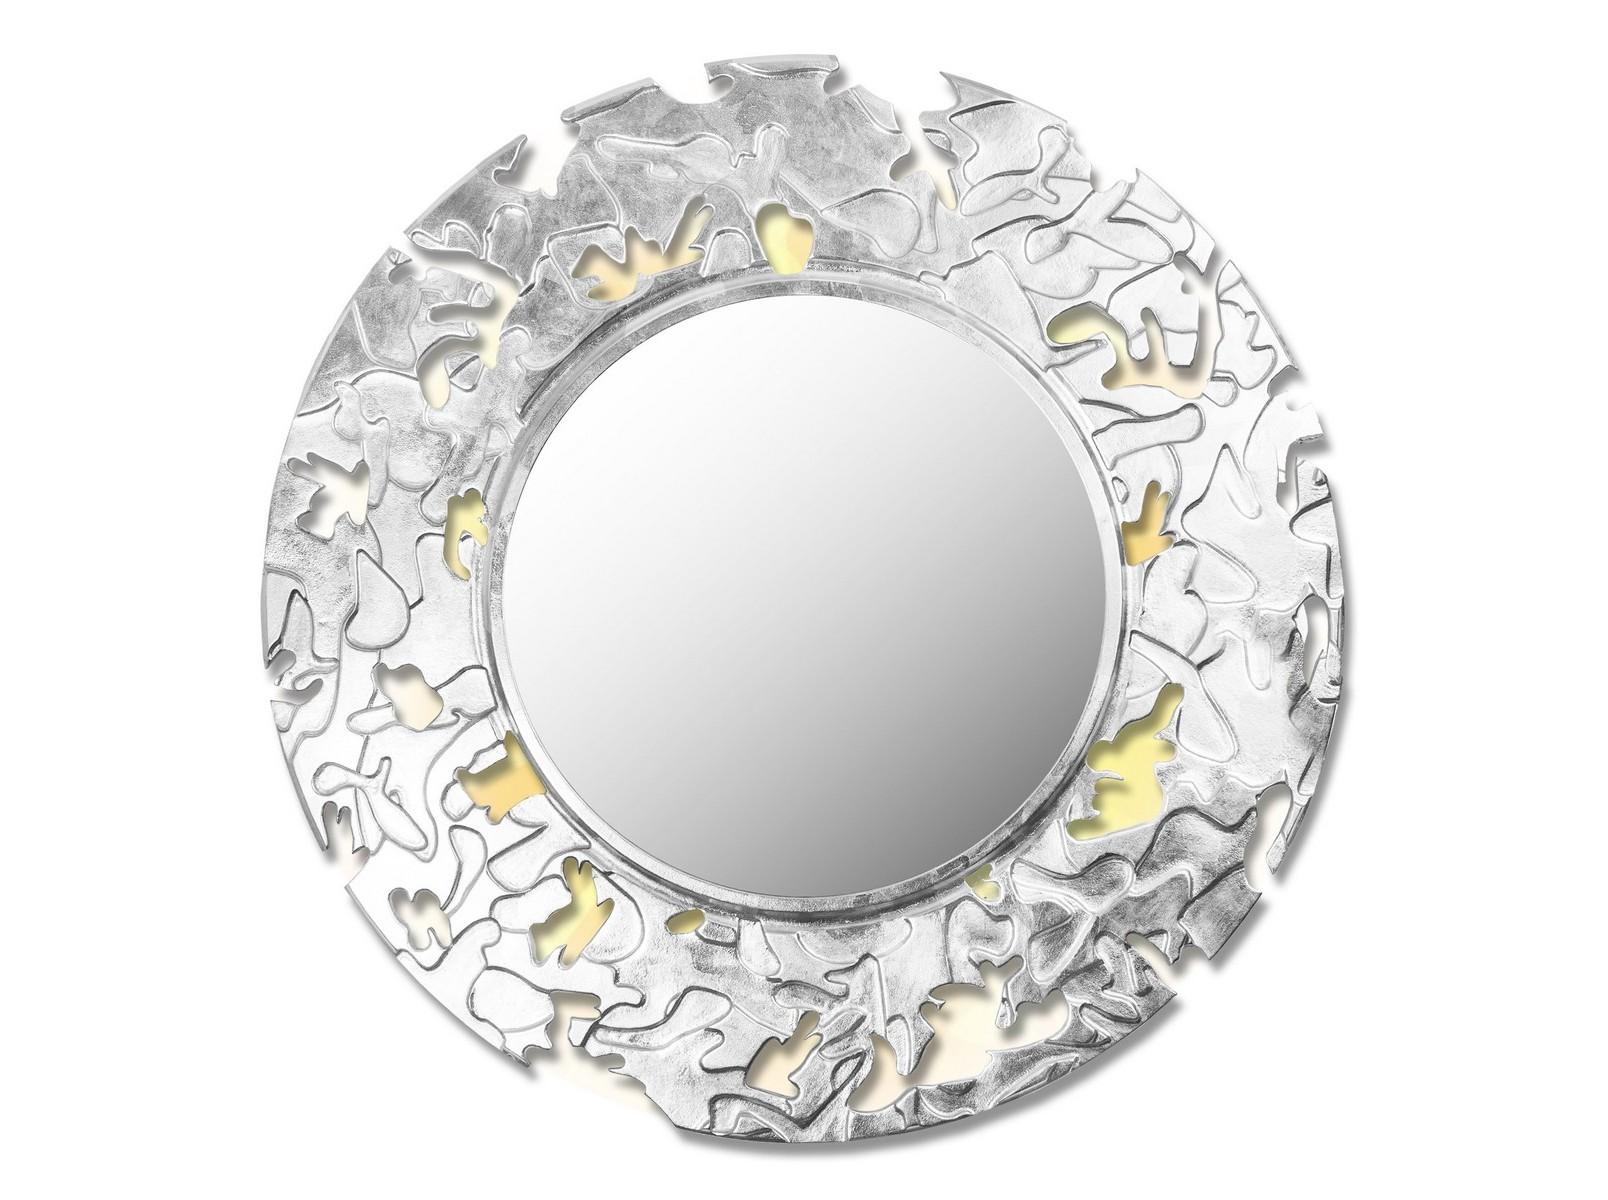 Зеркало CAMOUFLAGEНастенные зеркала<br>Данный вариант представлен в круглой форме, цвет: серебро.<br><br>Material: Дерево<br>Depth см: 0,8<br>Height см: None<br>Diameter см: 90